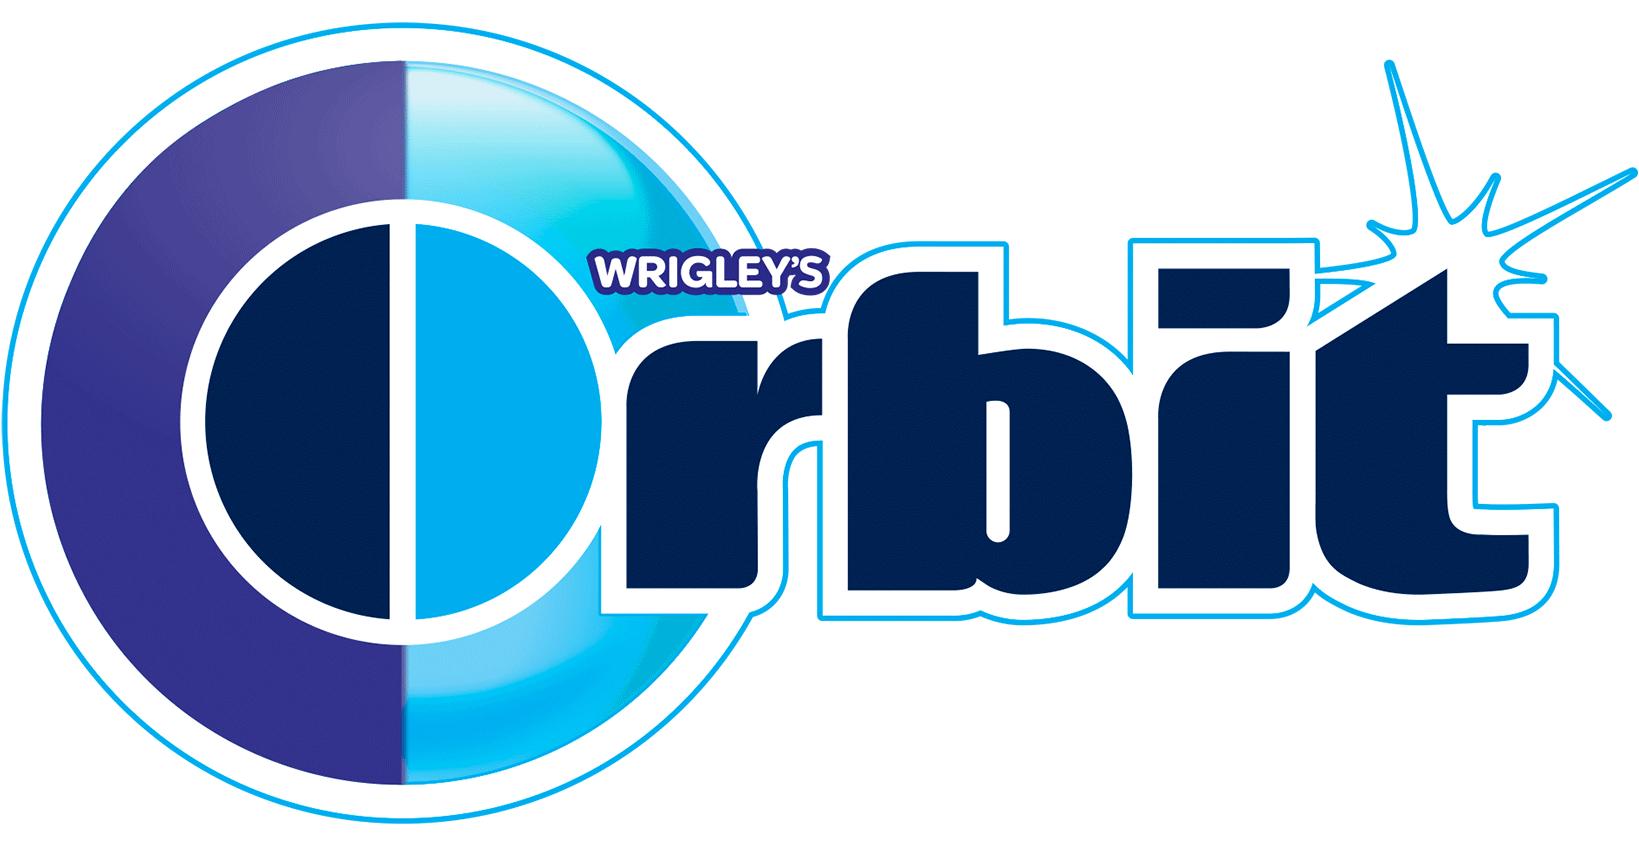 Orbitz Logo Png Images.